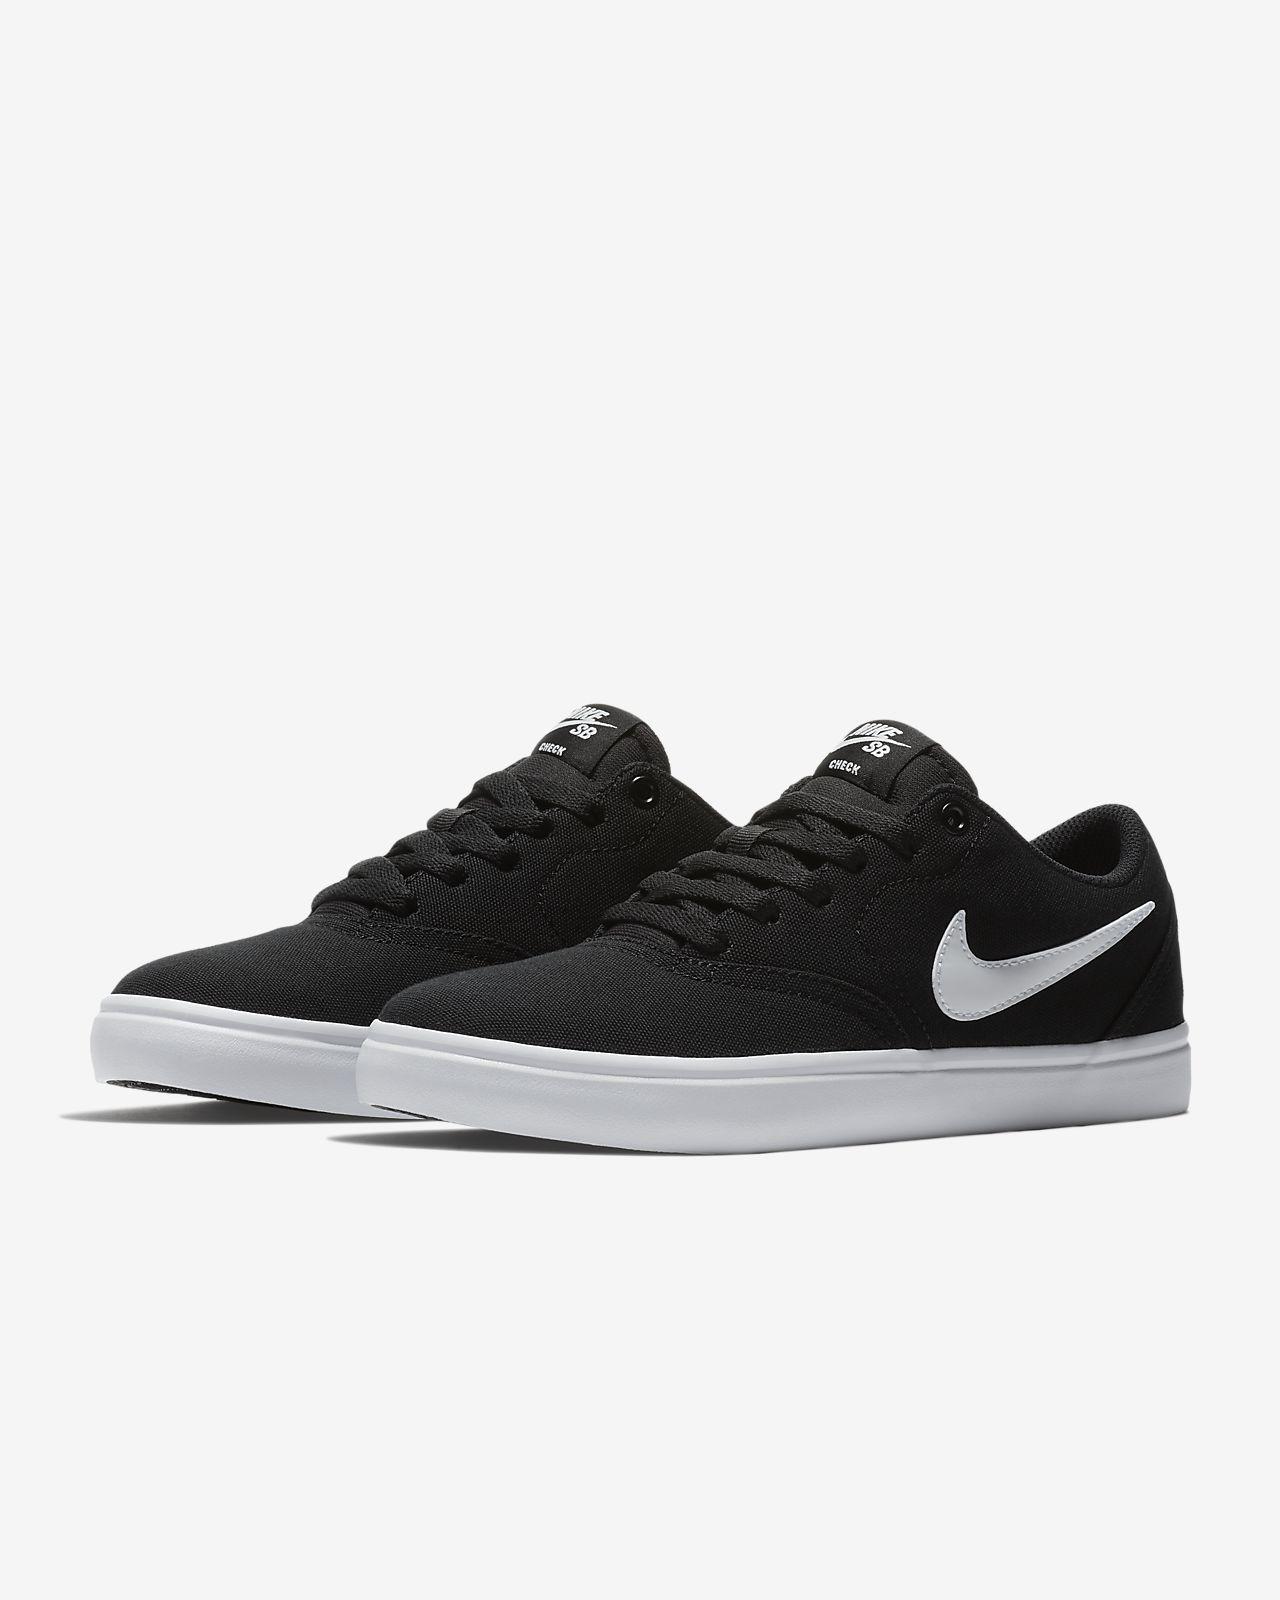 Nike SB Check Solarsoft Canvas Damen Skateboardschuh